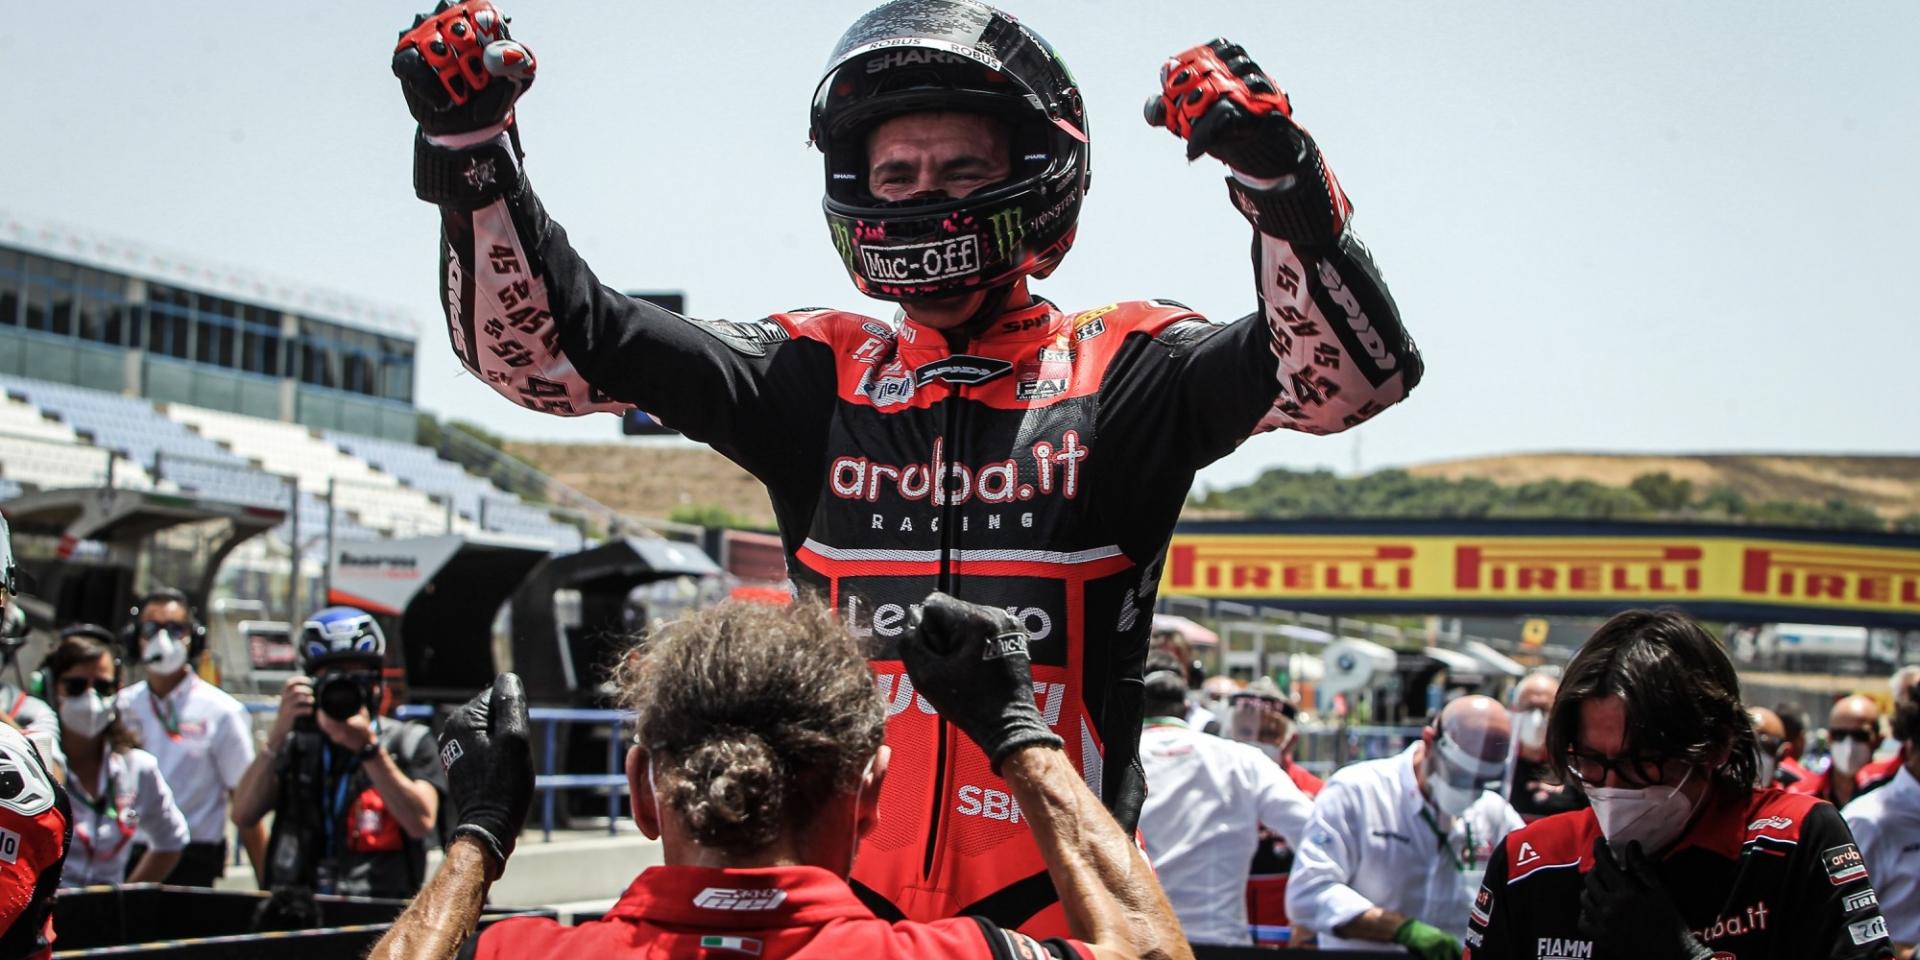 DUCATI V4制霸Jerez賽道!Scott Redding:我曾討厭自己,但現在我恢復水準並且再度獲勝!